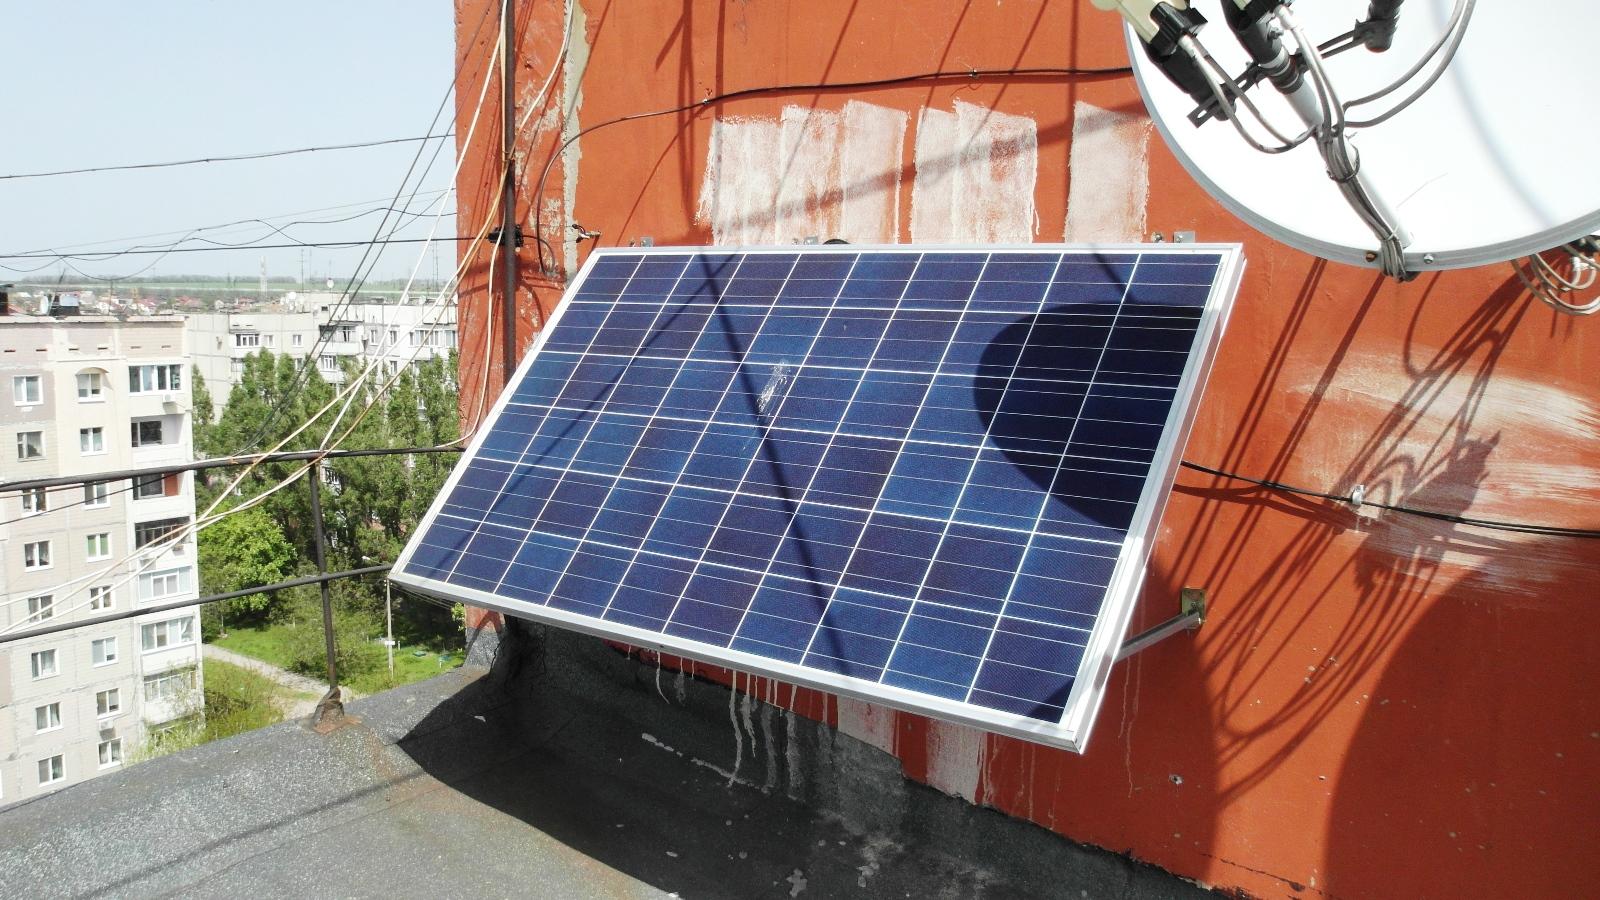 Енергетична незалежність: один маленький крок для ОСББ, но великий – для всього Запоріжжя (ФОТО)